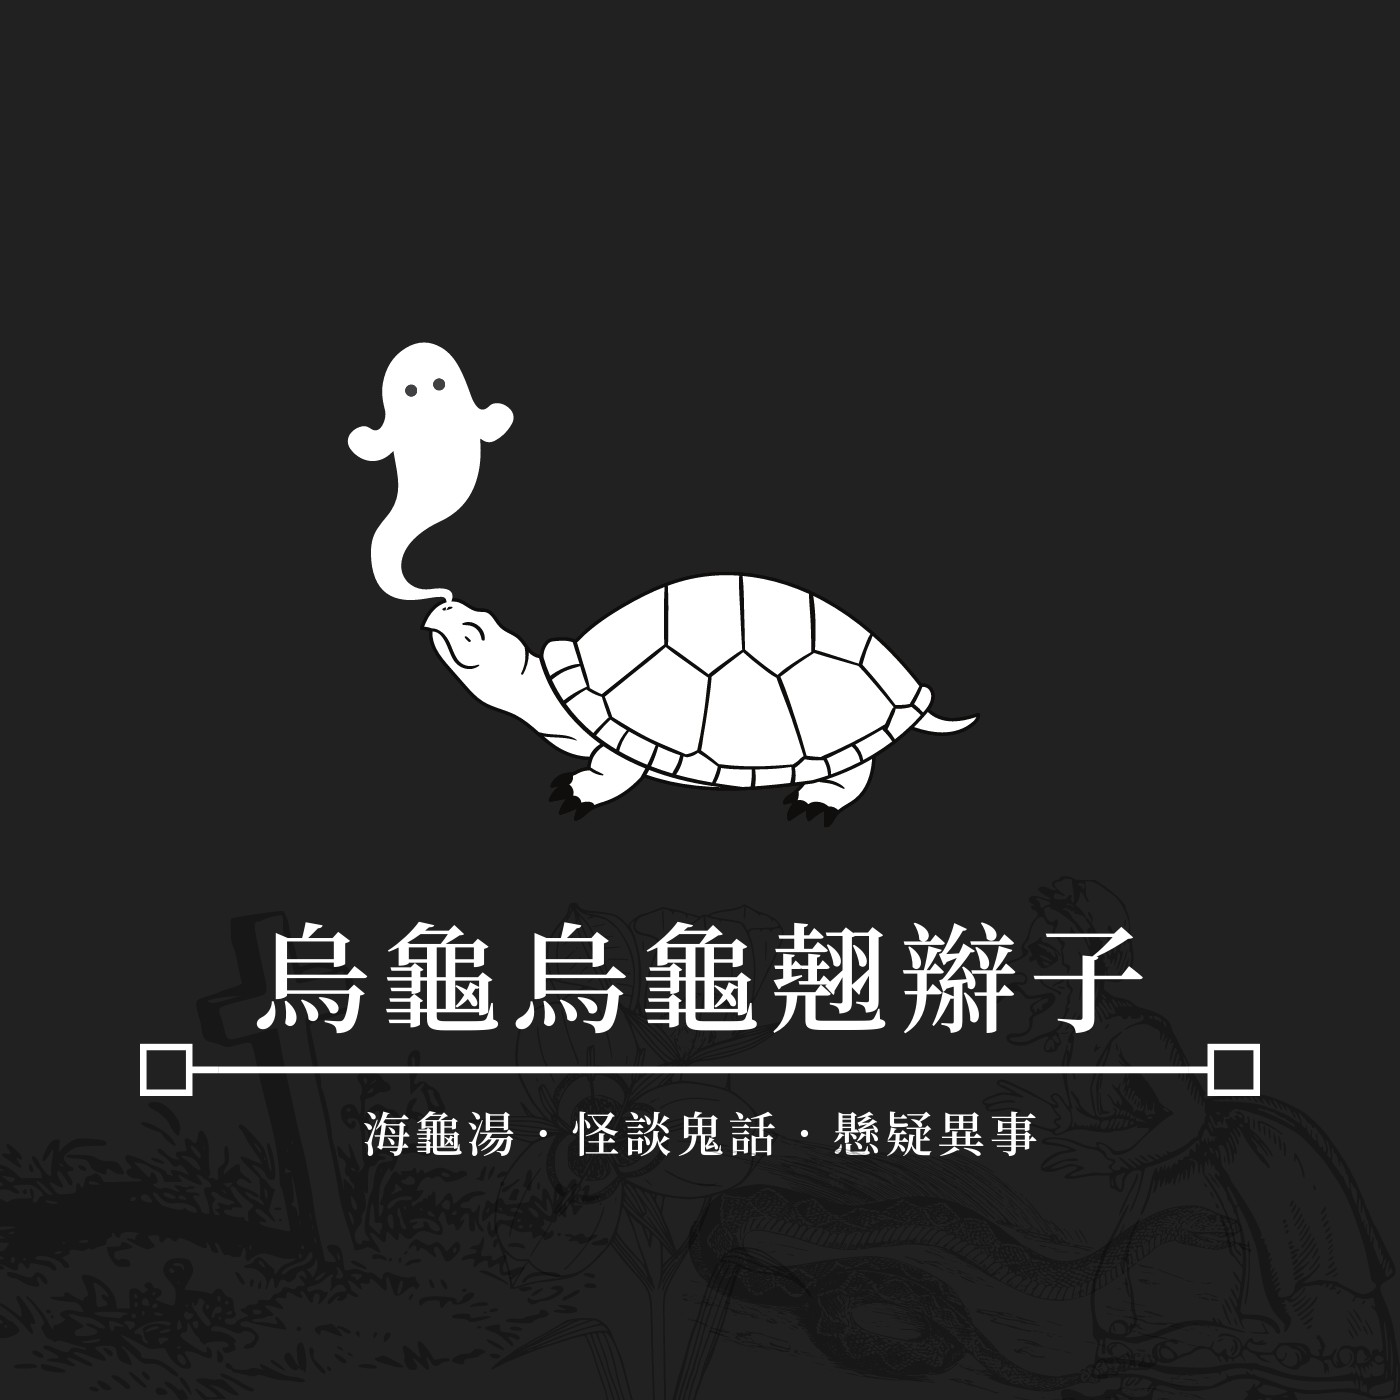 EP01【鄉野怪談】台灣亡美傳說:林投姐、椅仔姑、陳守娘|海龜湯:酒吧櫃檯